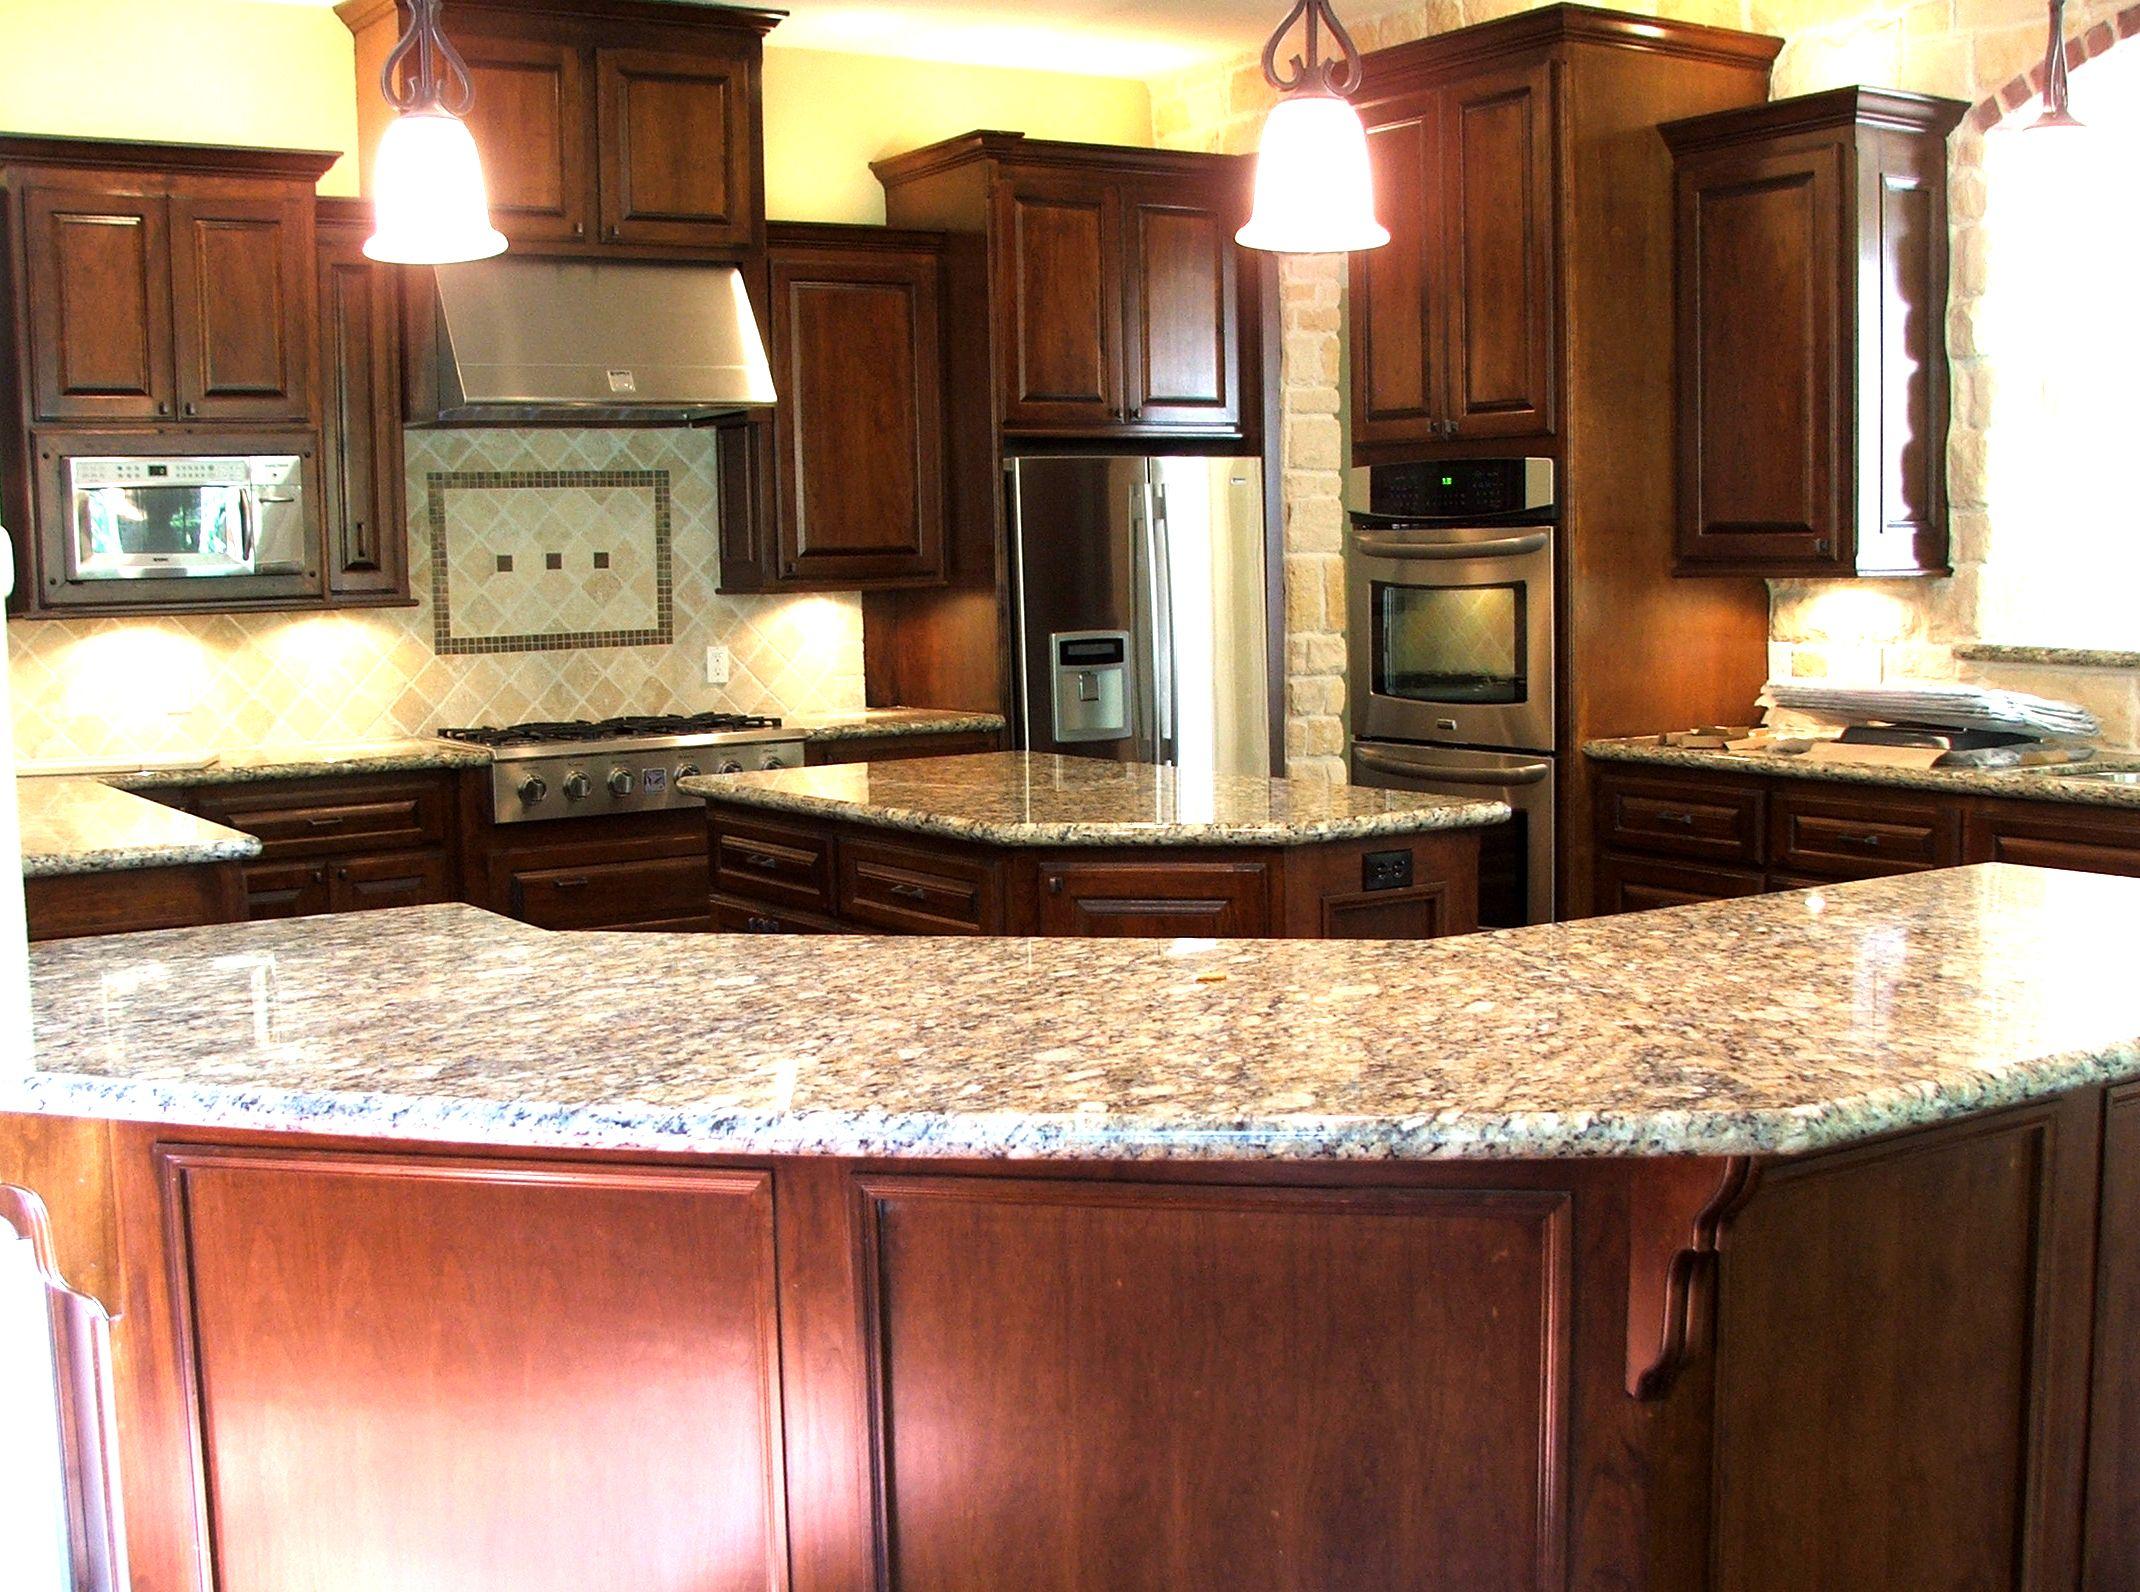 Cherry cabinets with granite countertop Pretty but center island